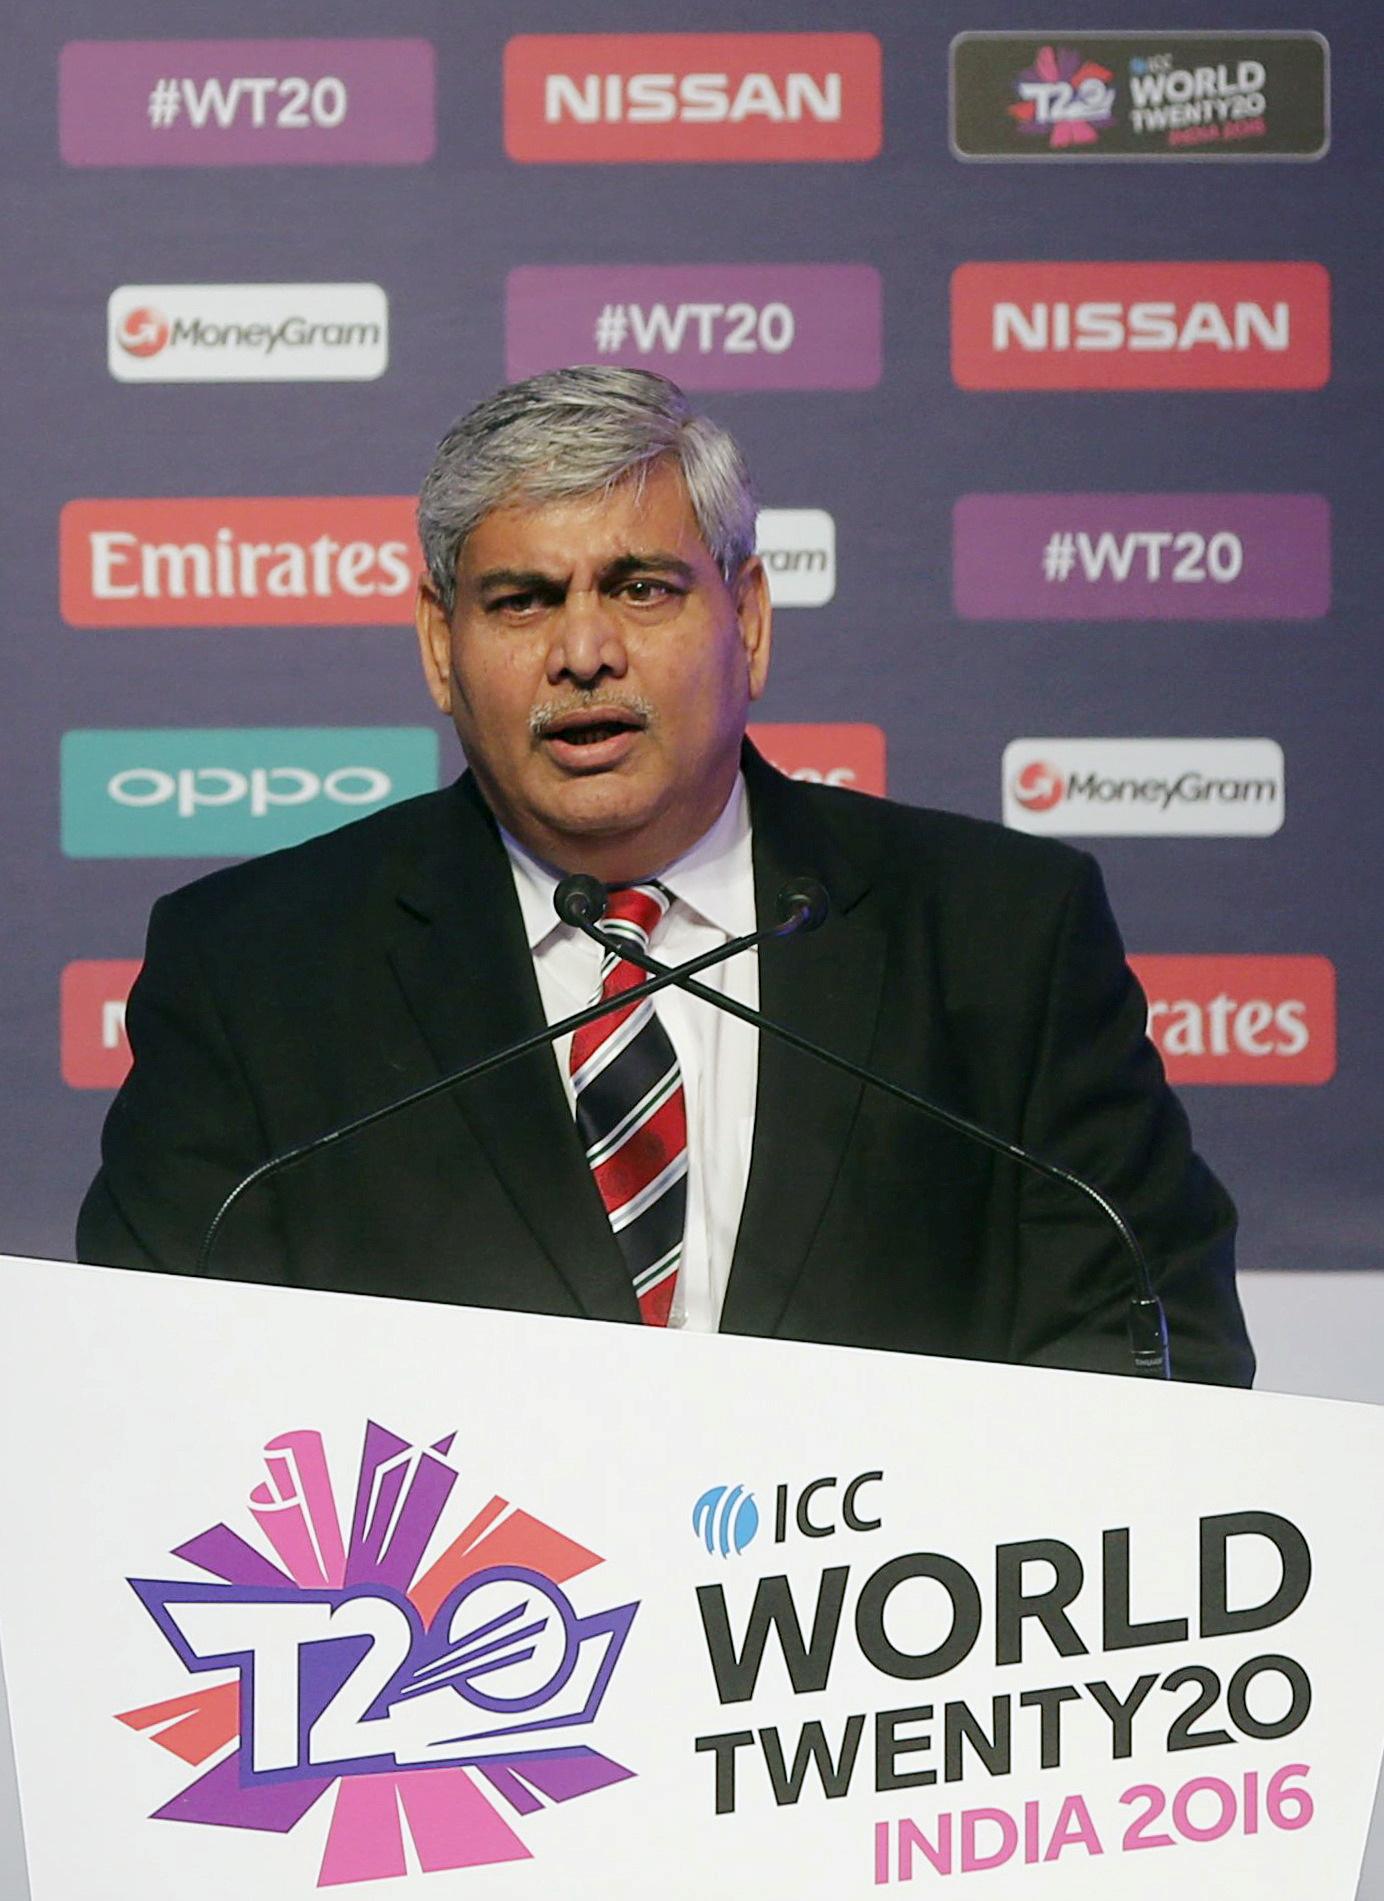 FILE PHOTO: Shashank Manohar, Chairman of International Cricket Council (ICC), speaks during a ceremony of World Twenty20 in Mumbai, India, December 11, 2015. REUTERS/Shailesh Andrade/File Photo